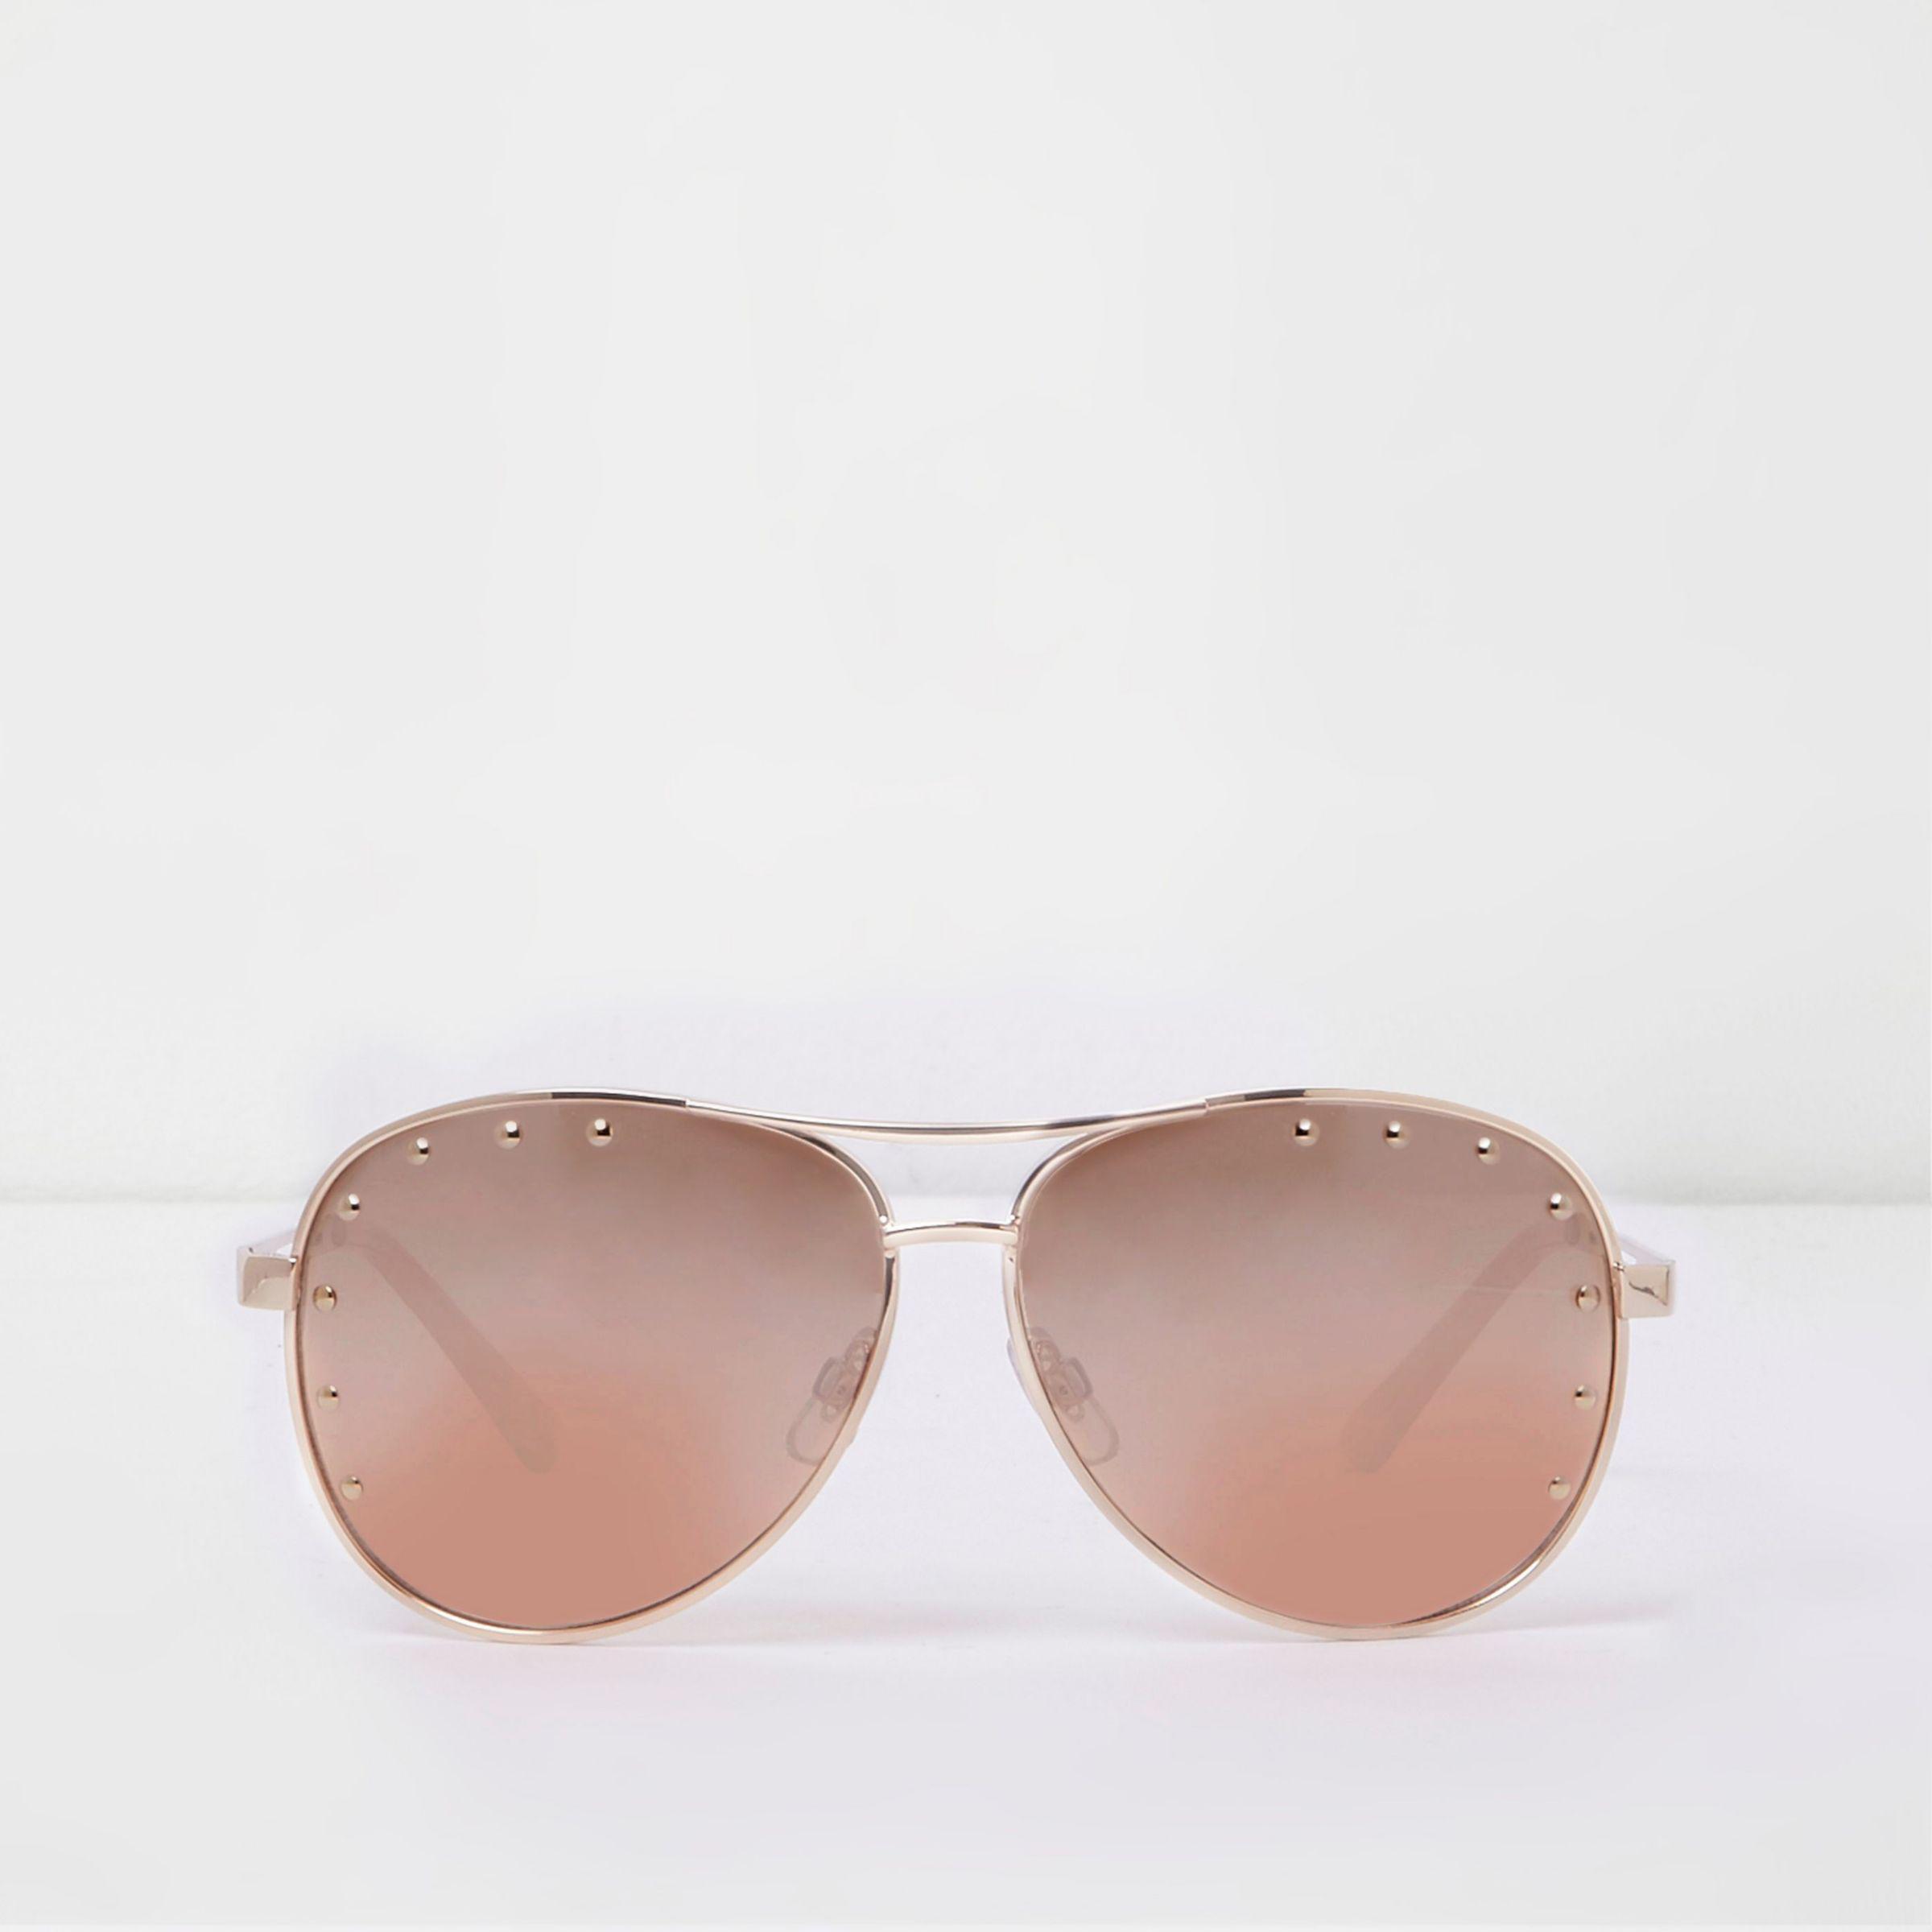 Womens Pink gold tone studded aviator sunglasses River Island UpHXrokz